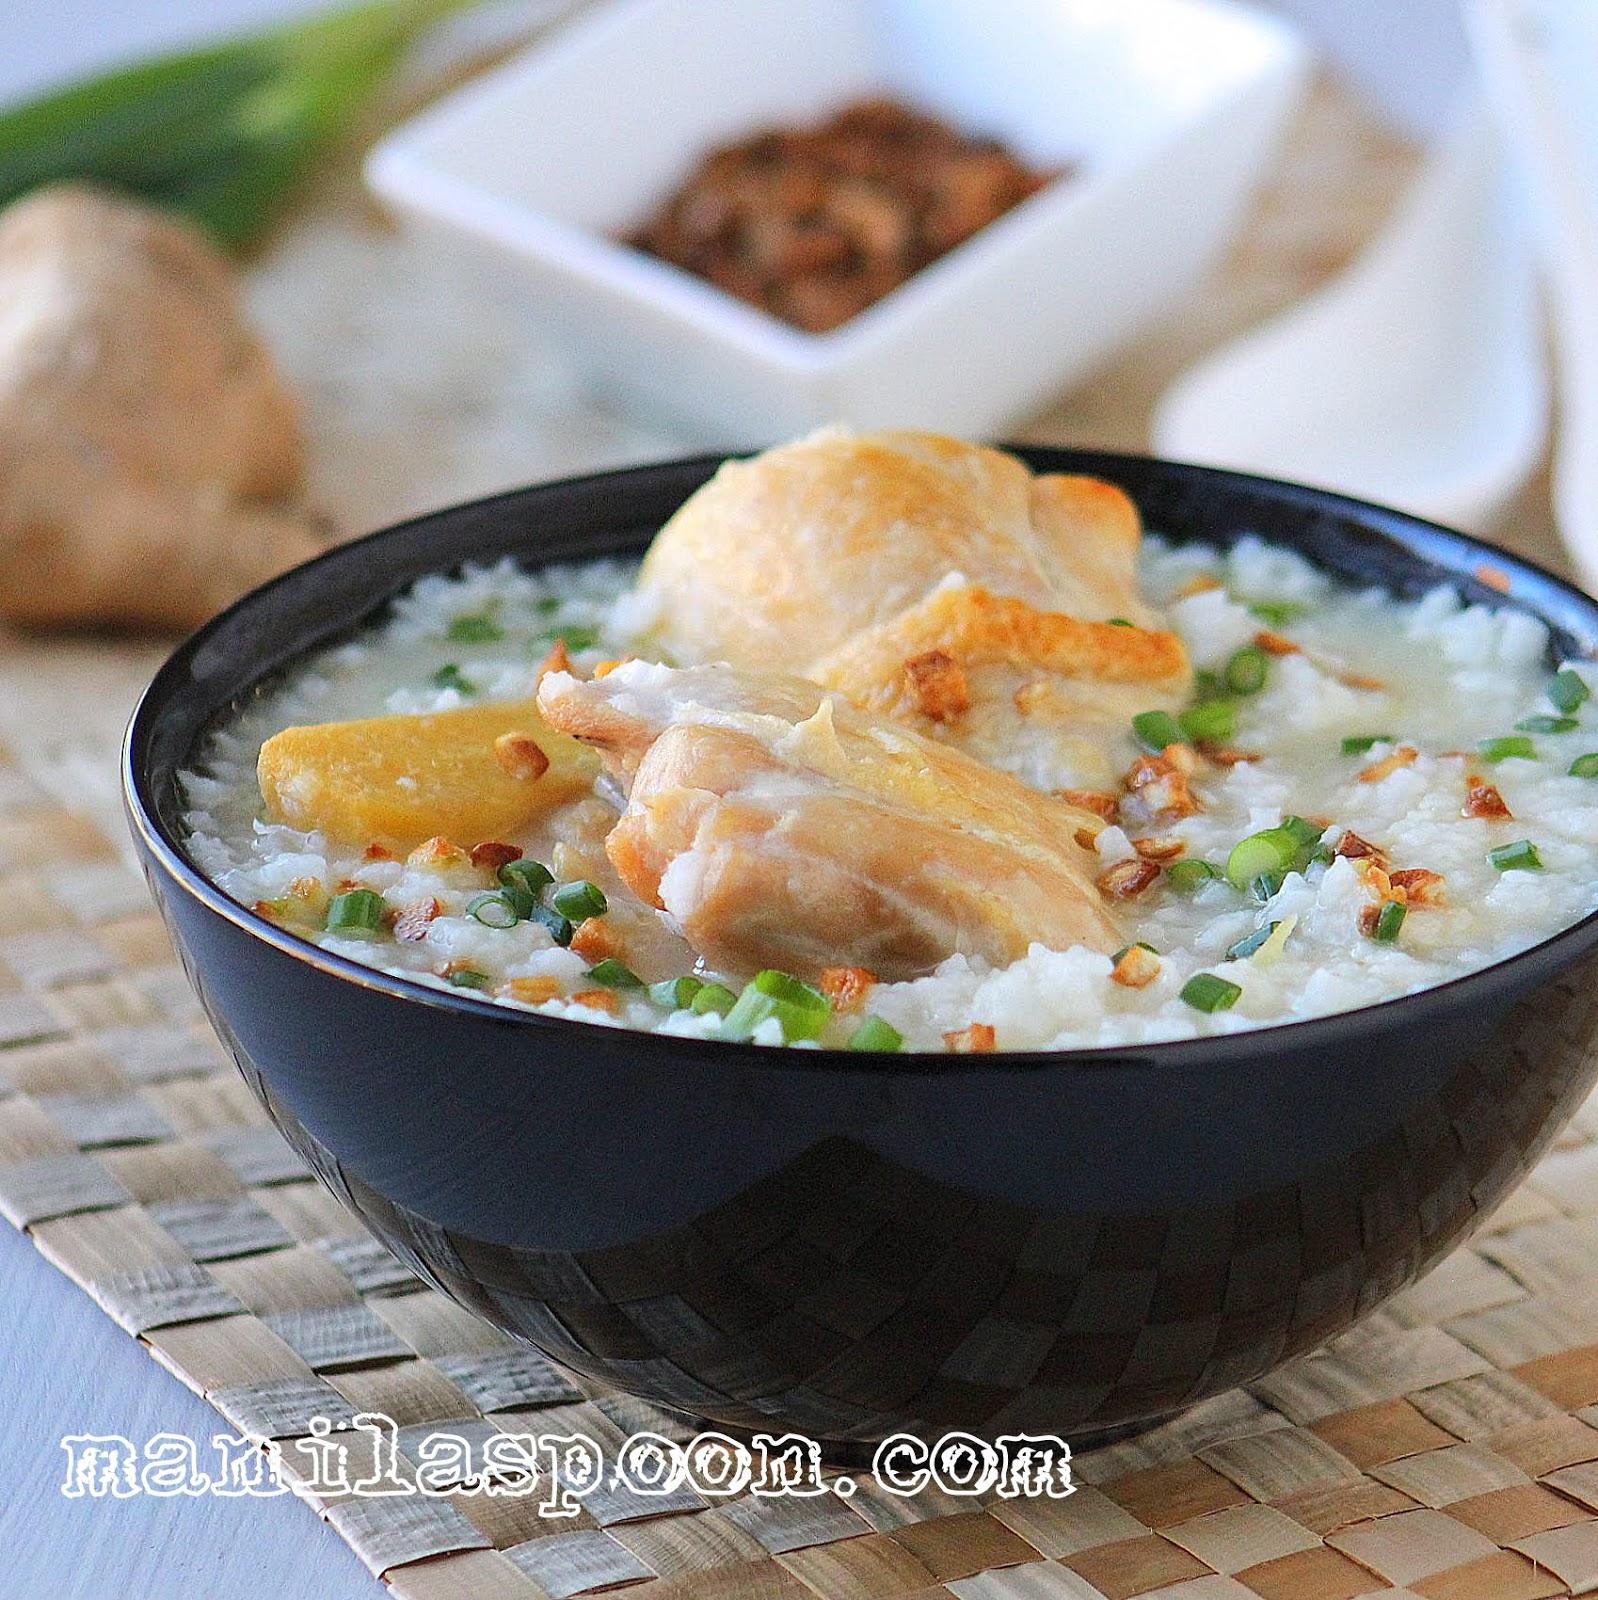 Arroz Caldo (Savory Chicken and Rice Porridge)